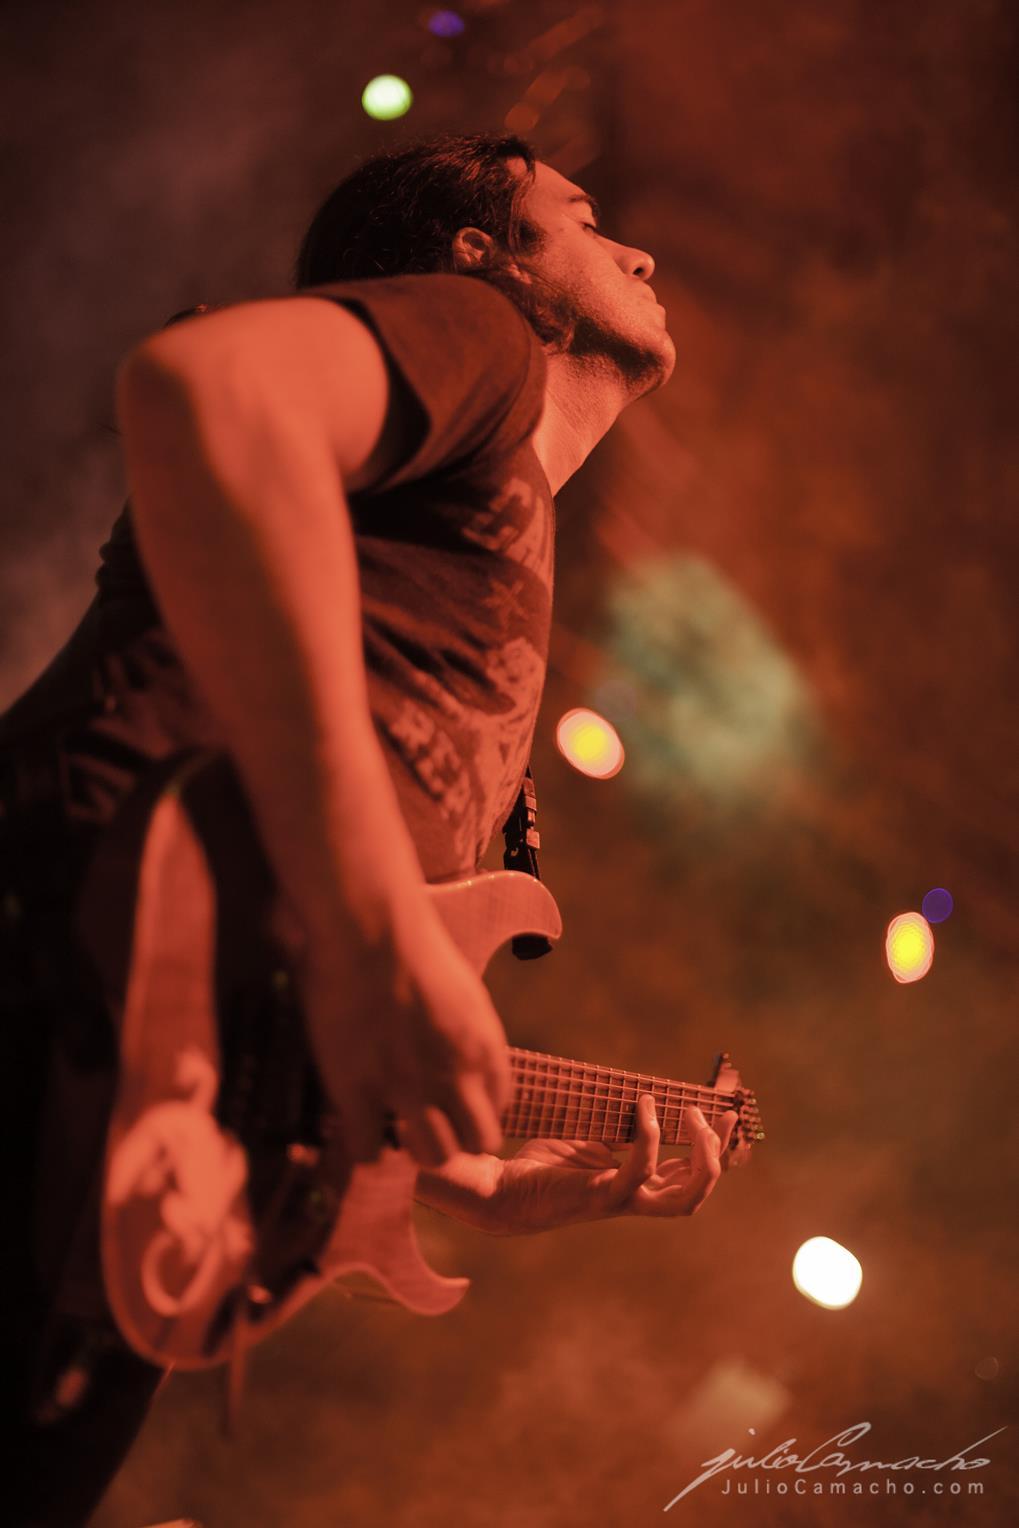 2014-10-30 31 CAST TOUR Ensenada y Tijuana - 1537 - www.Juli (Copy).jpg